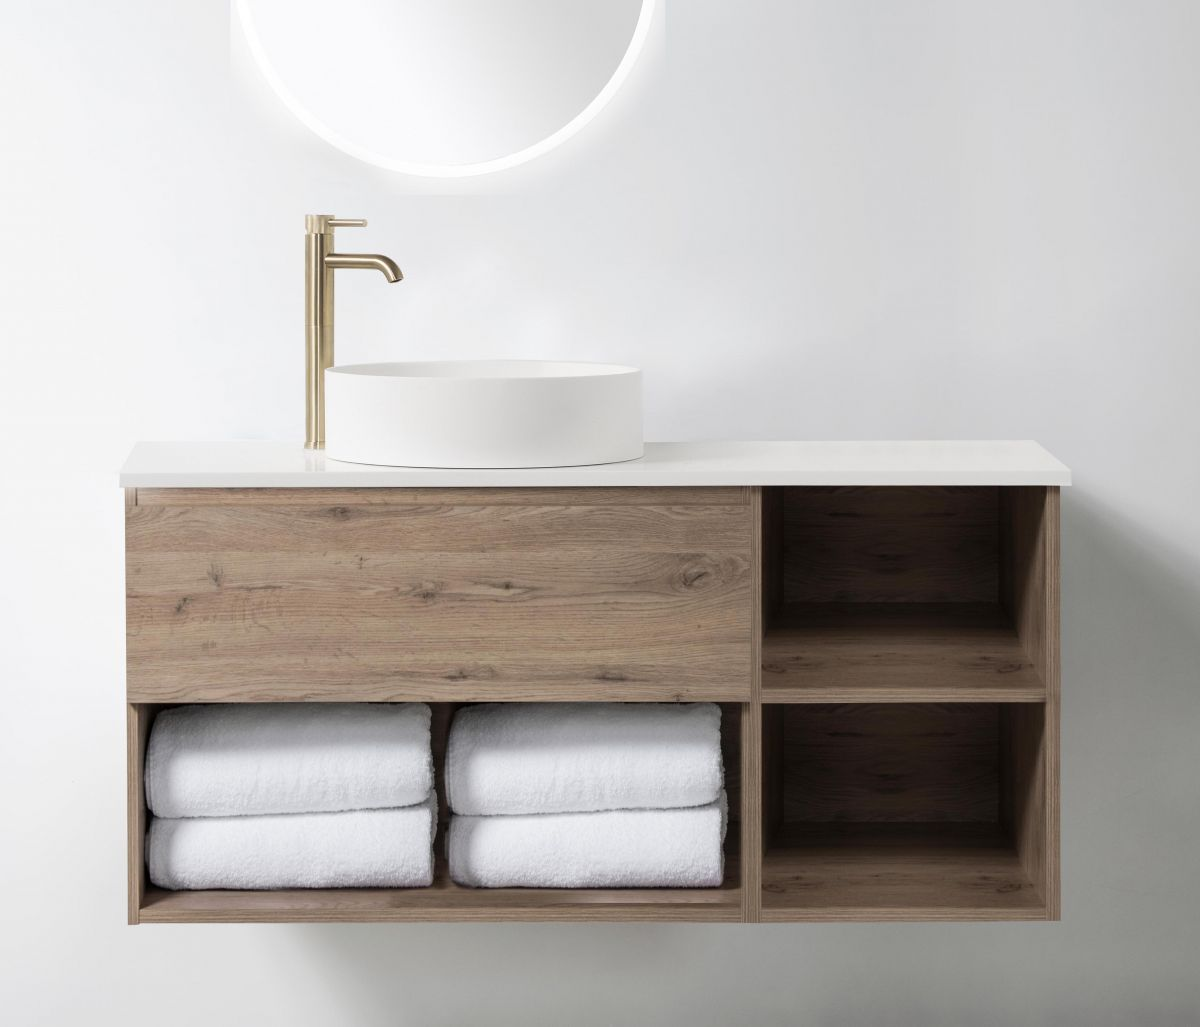 Soft Solid-Surface 900, 1 Drawer, 1 Open Shelf Wall-Hung Vanity + 300 Open Shelf Module